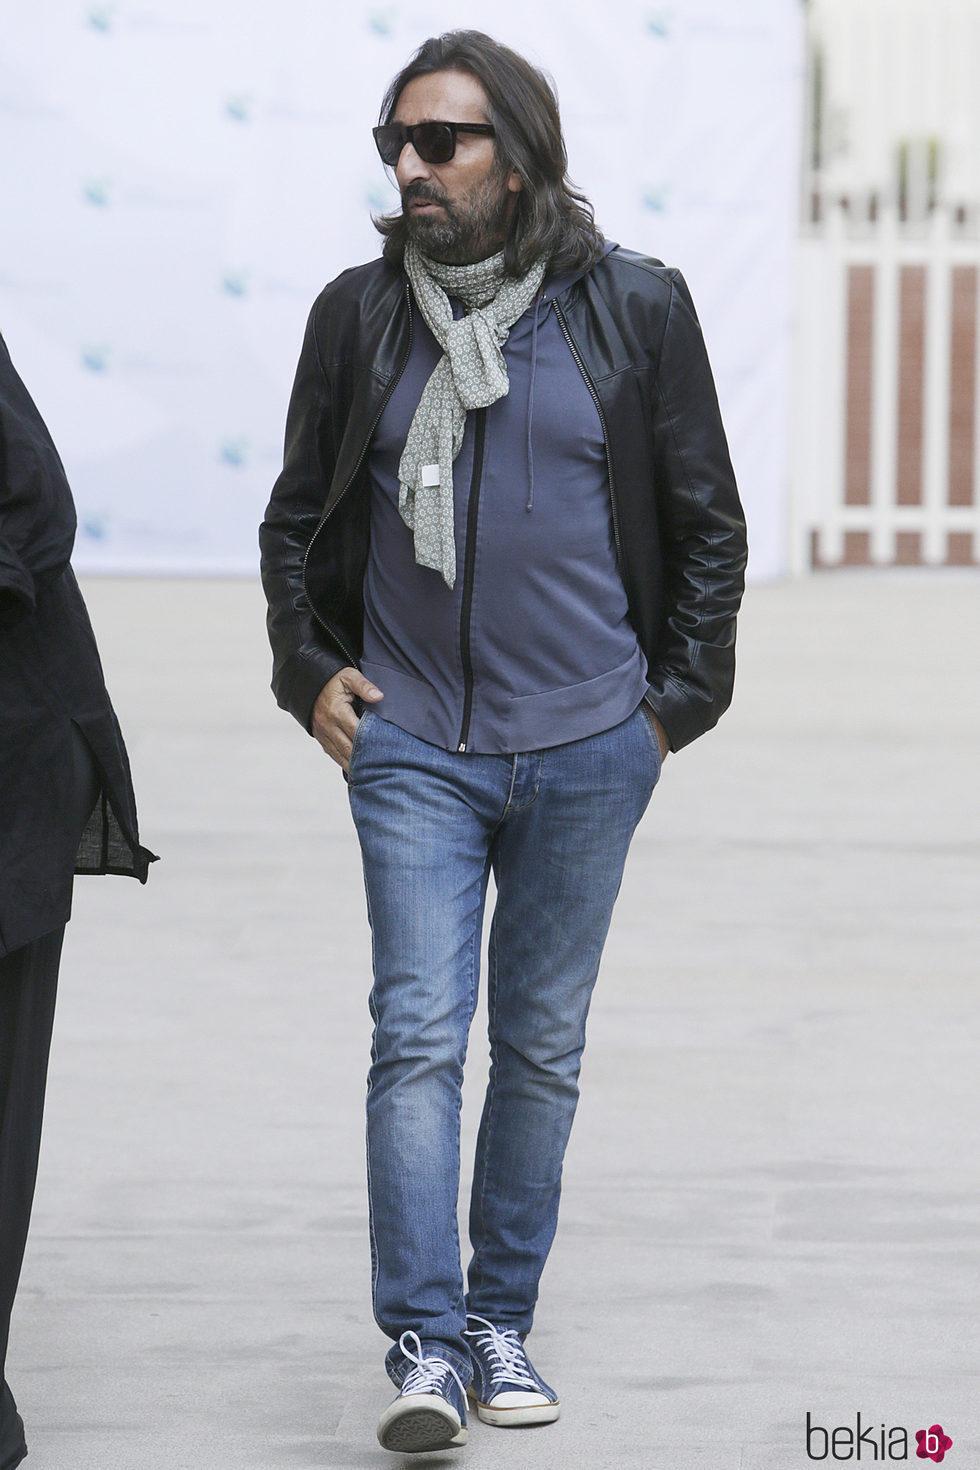 Antonio Carmona saliendo del hospital donde ha estado ingresado